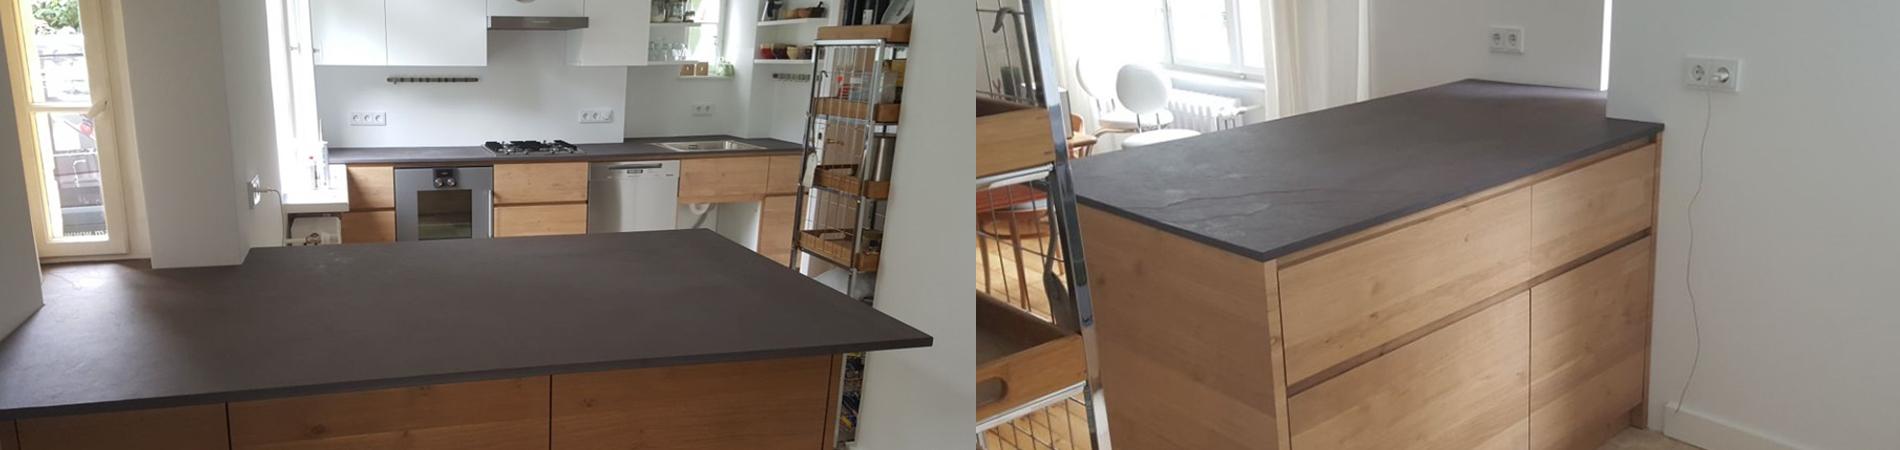 Schiefer Tischplatten nach Maß